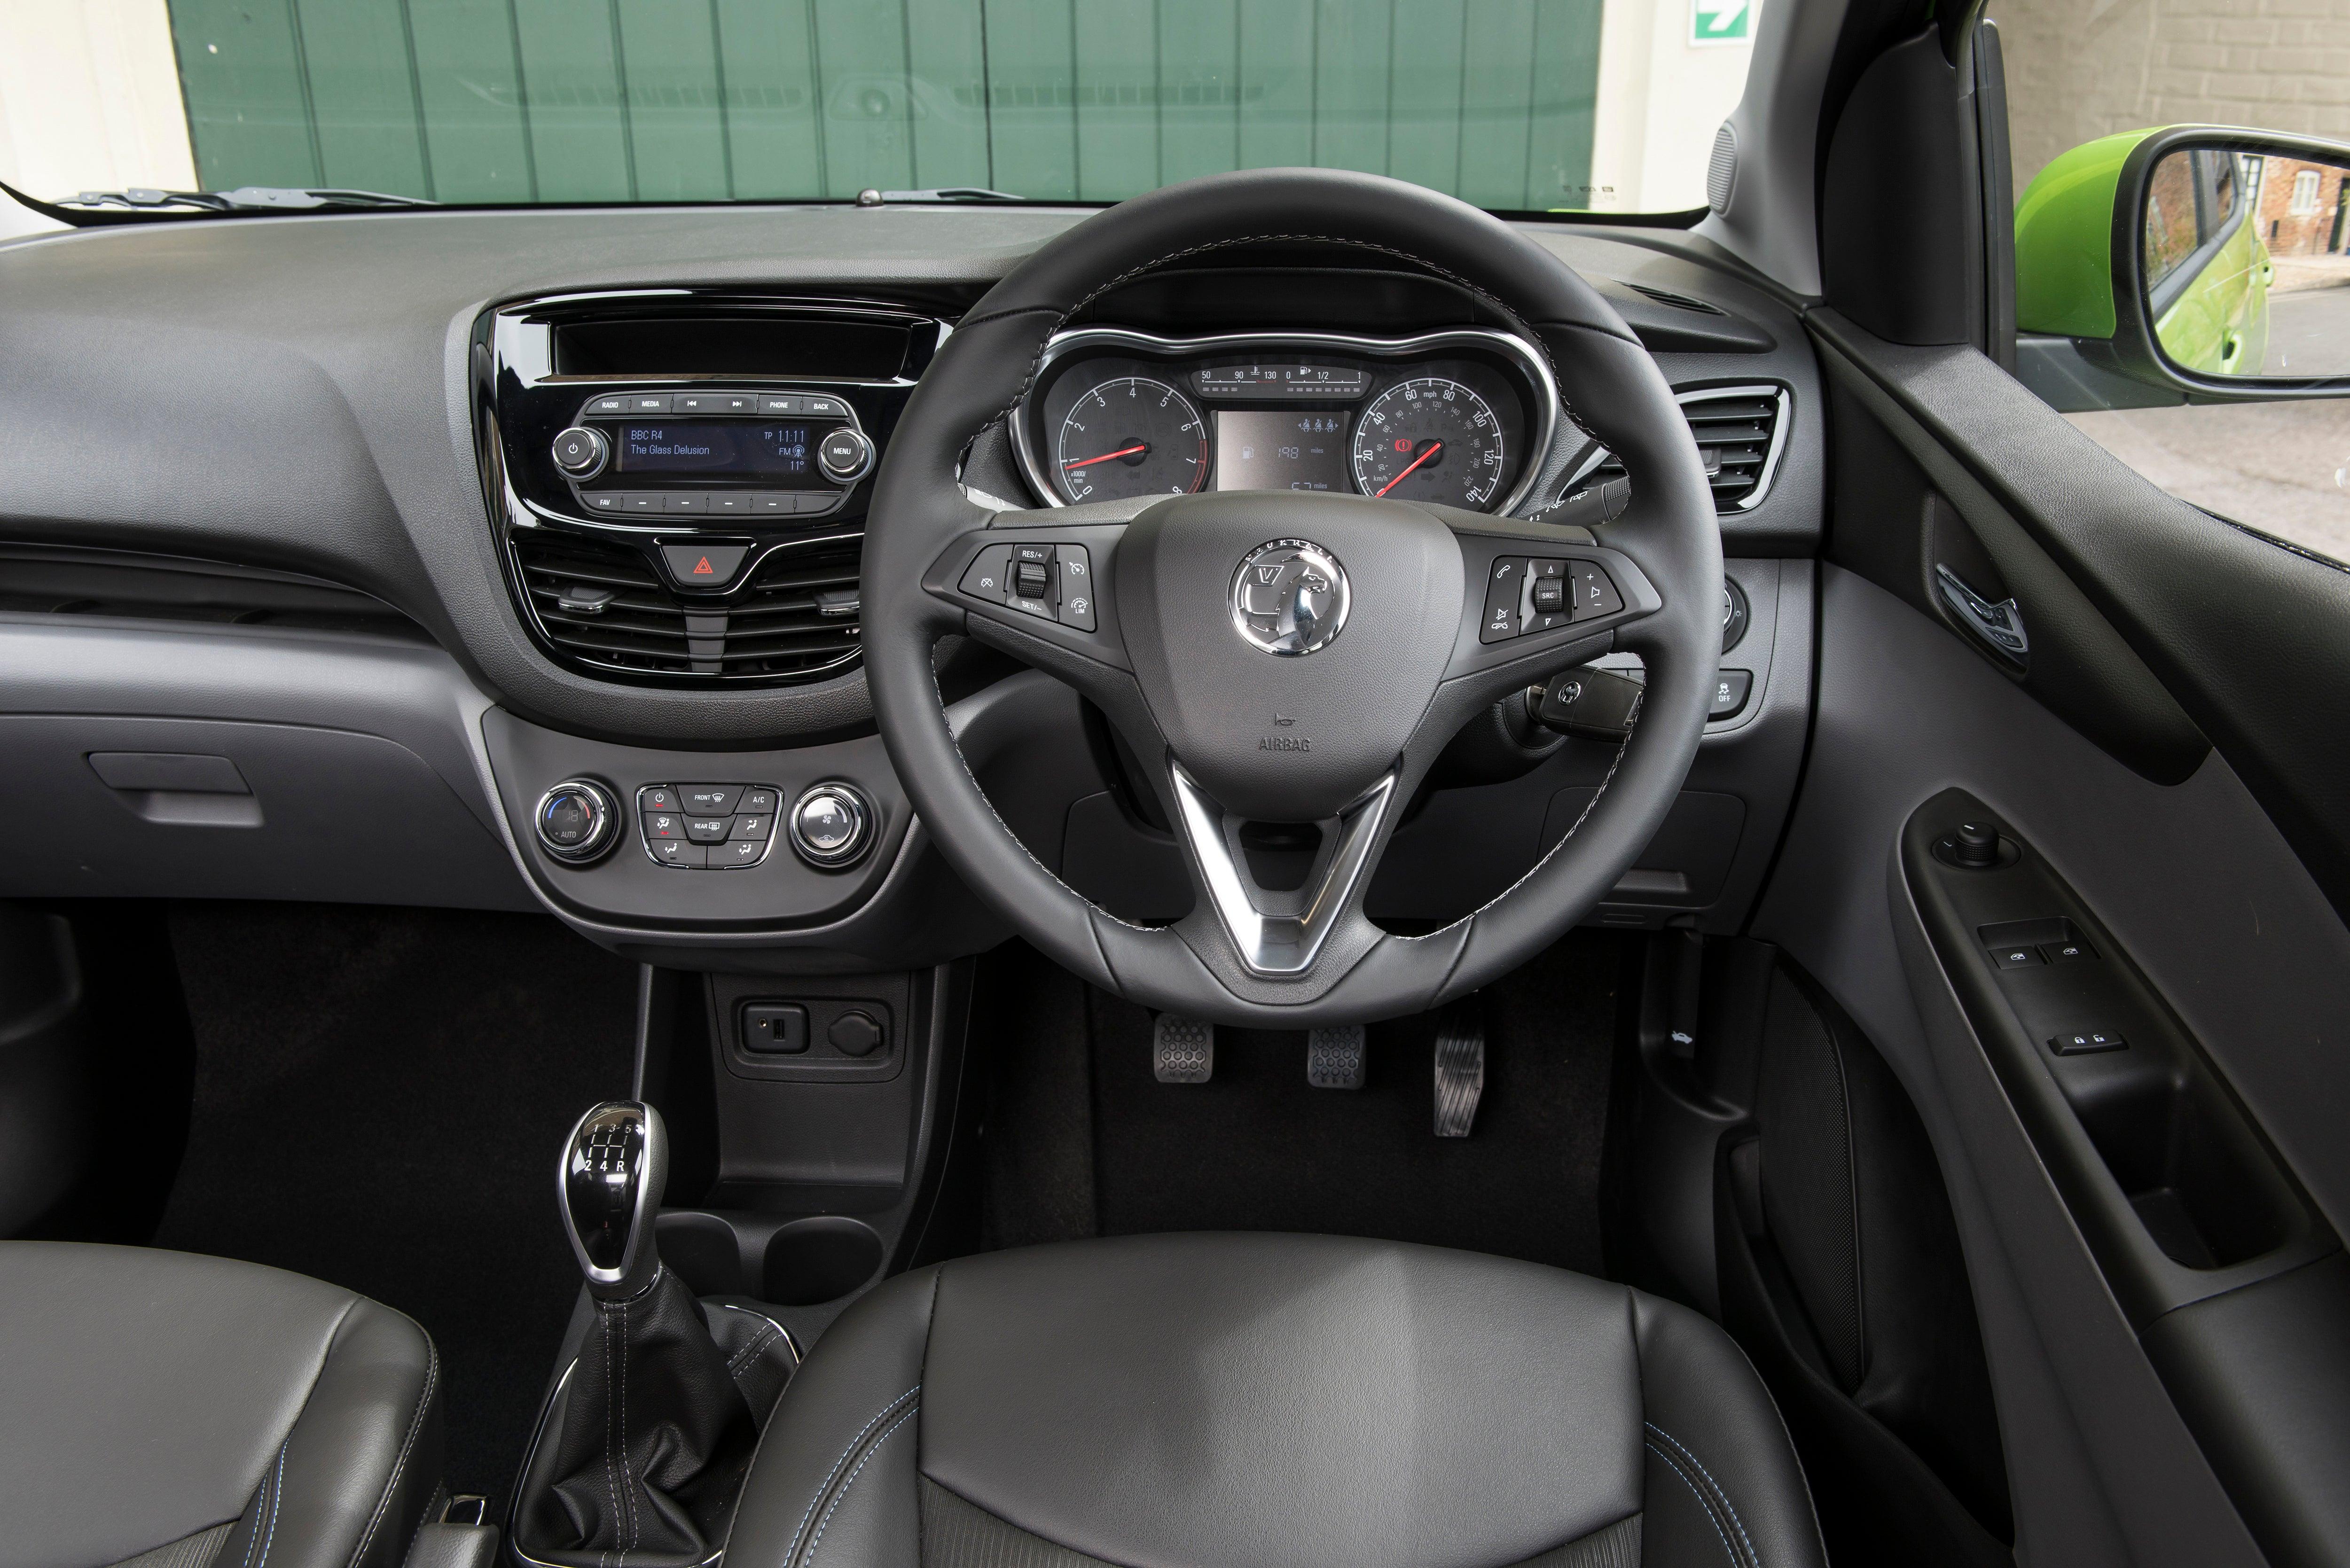 Vauxhall Viva Driver's Seat